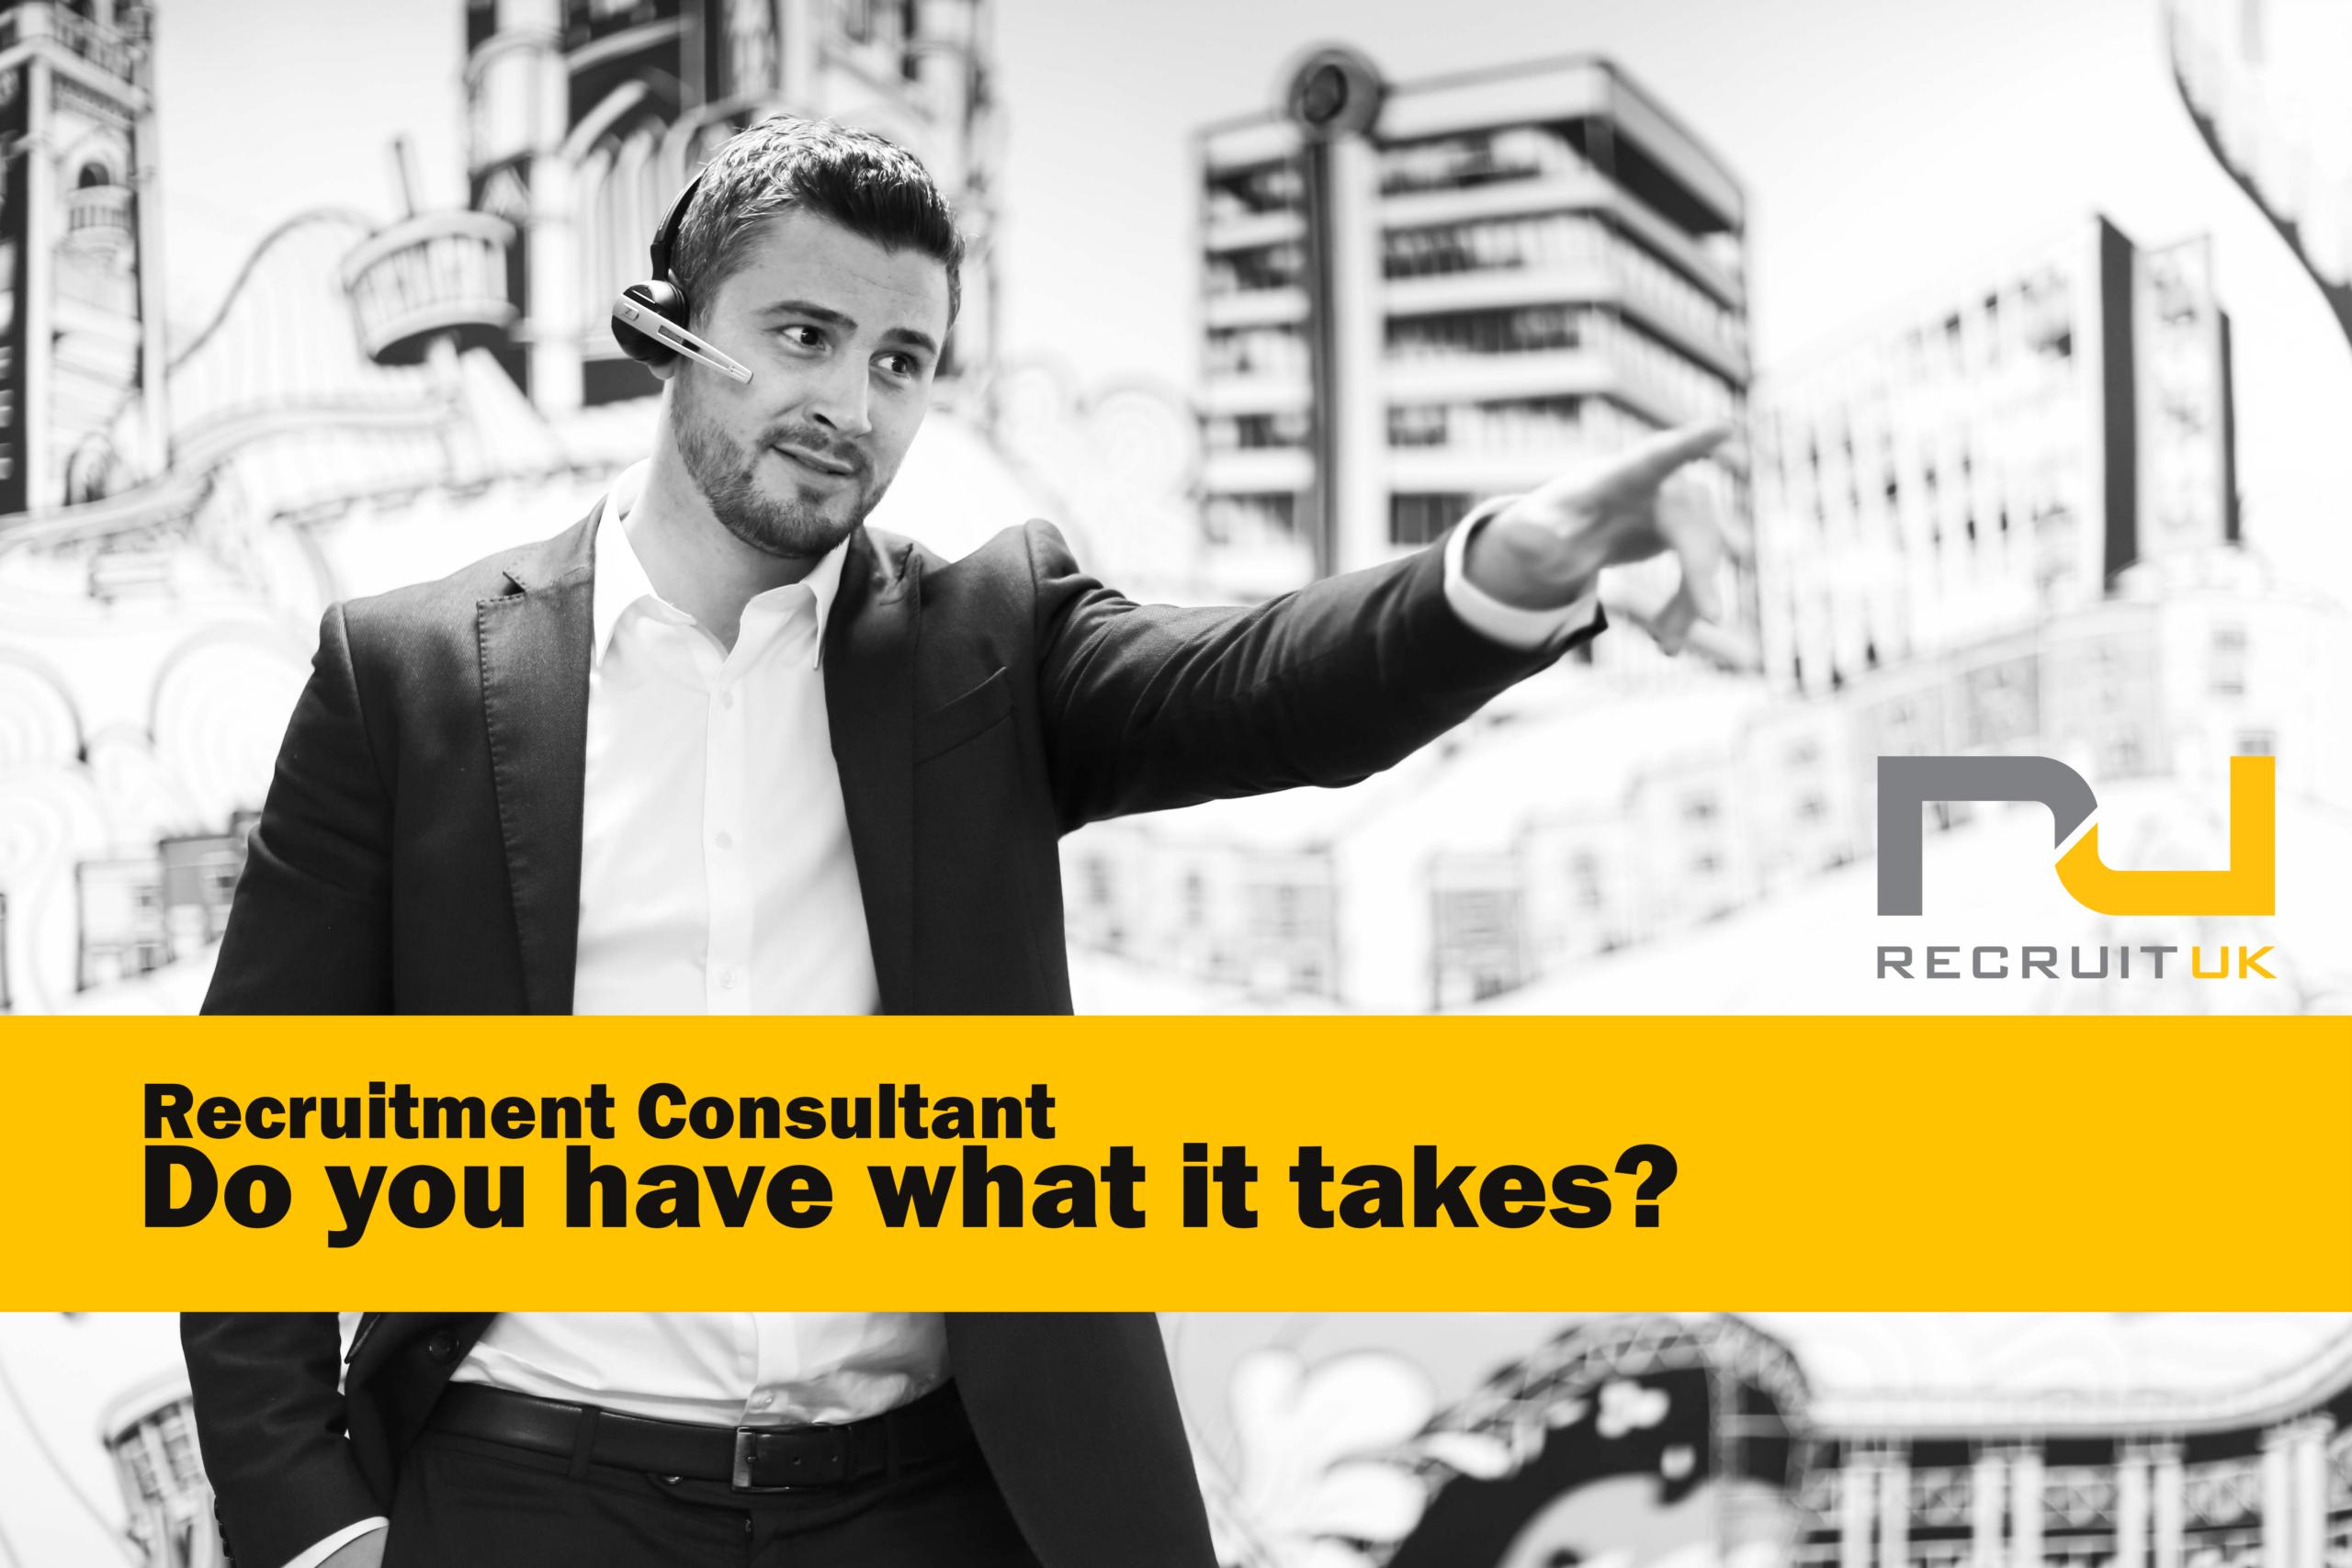 Graduate Recruitment Consultant - sg.linkedin.com